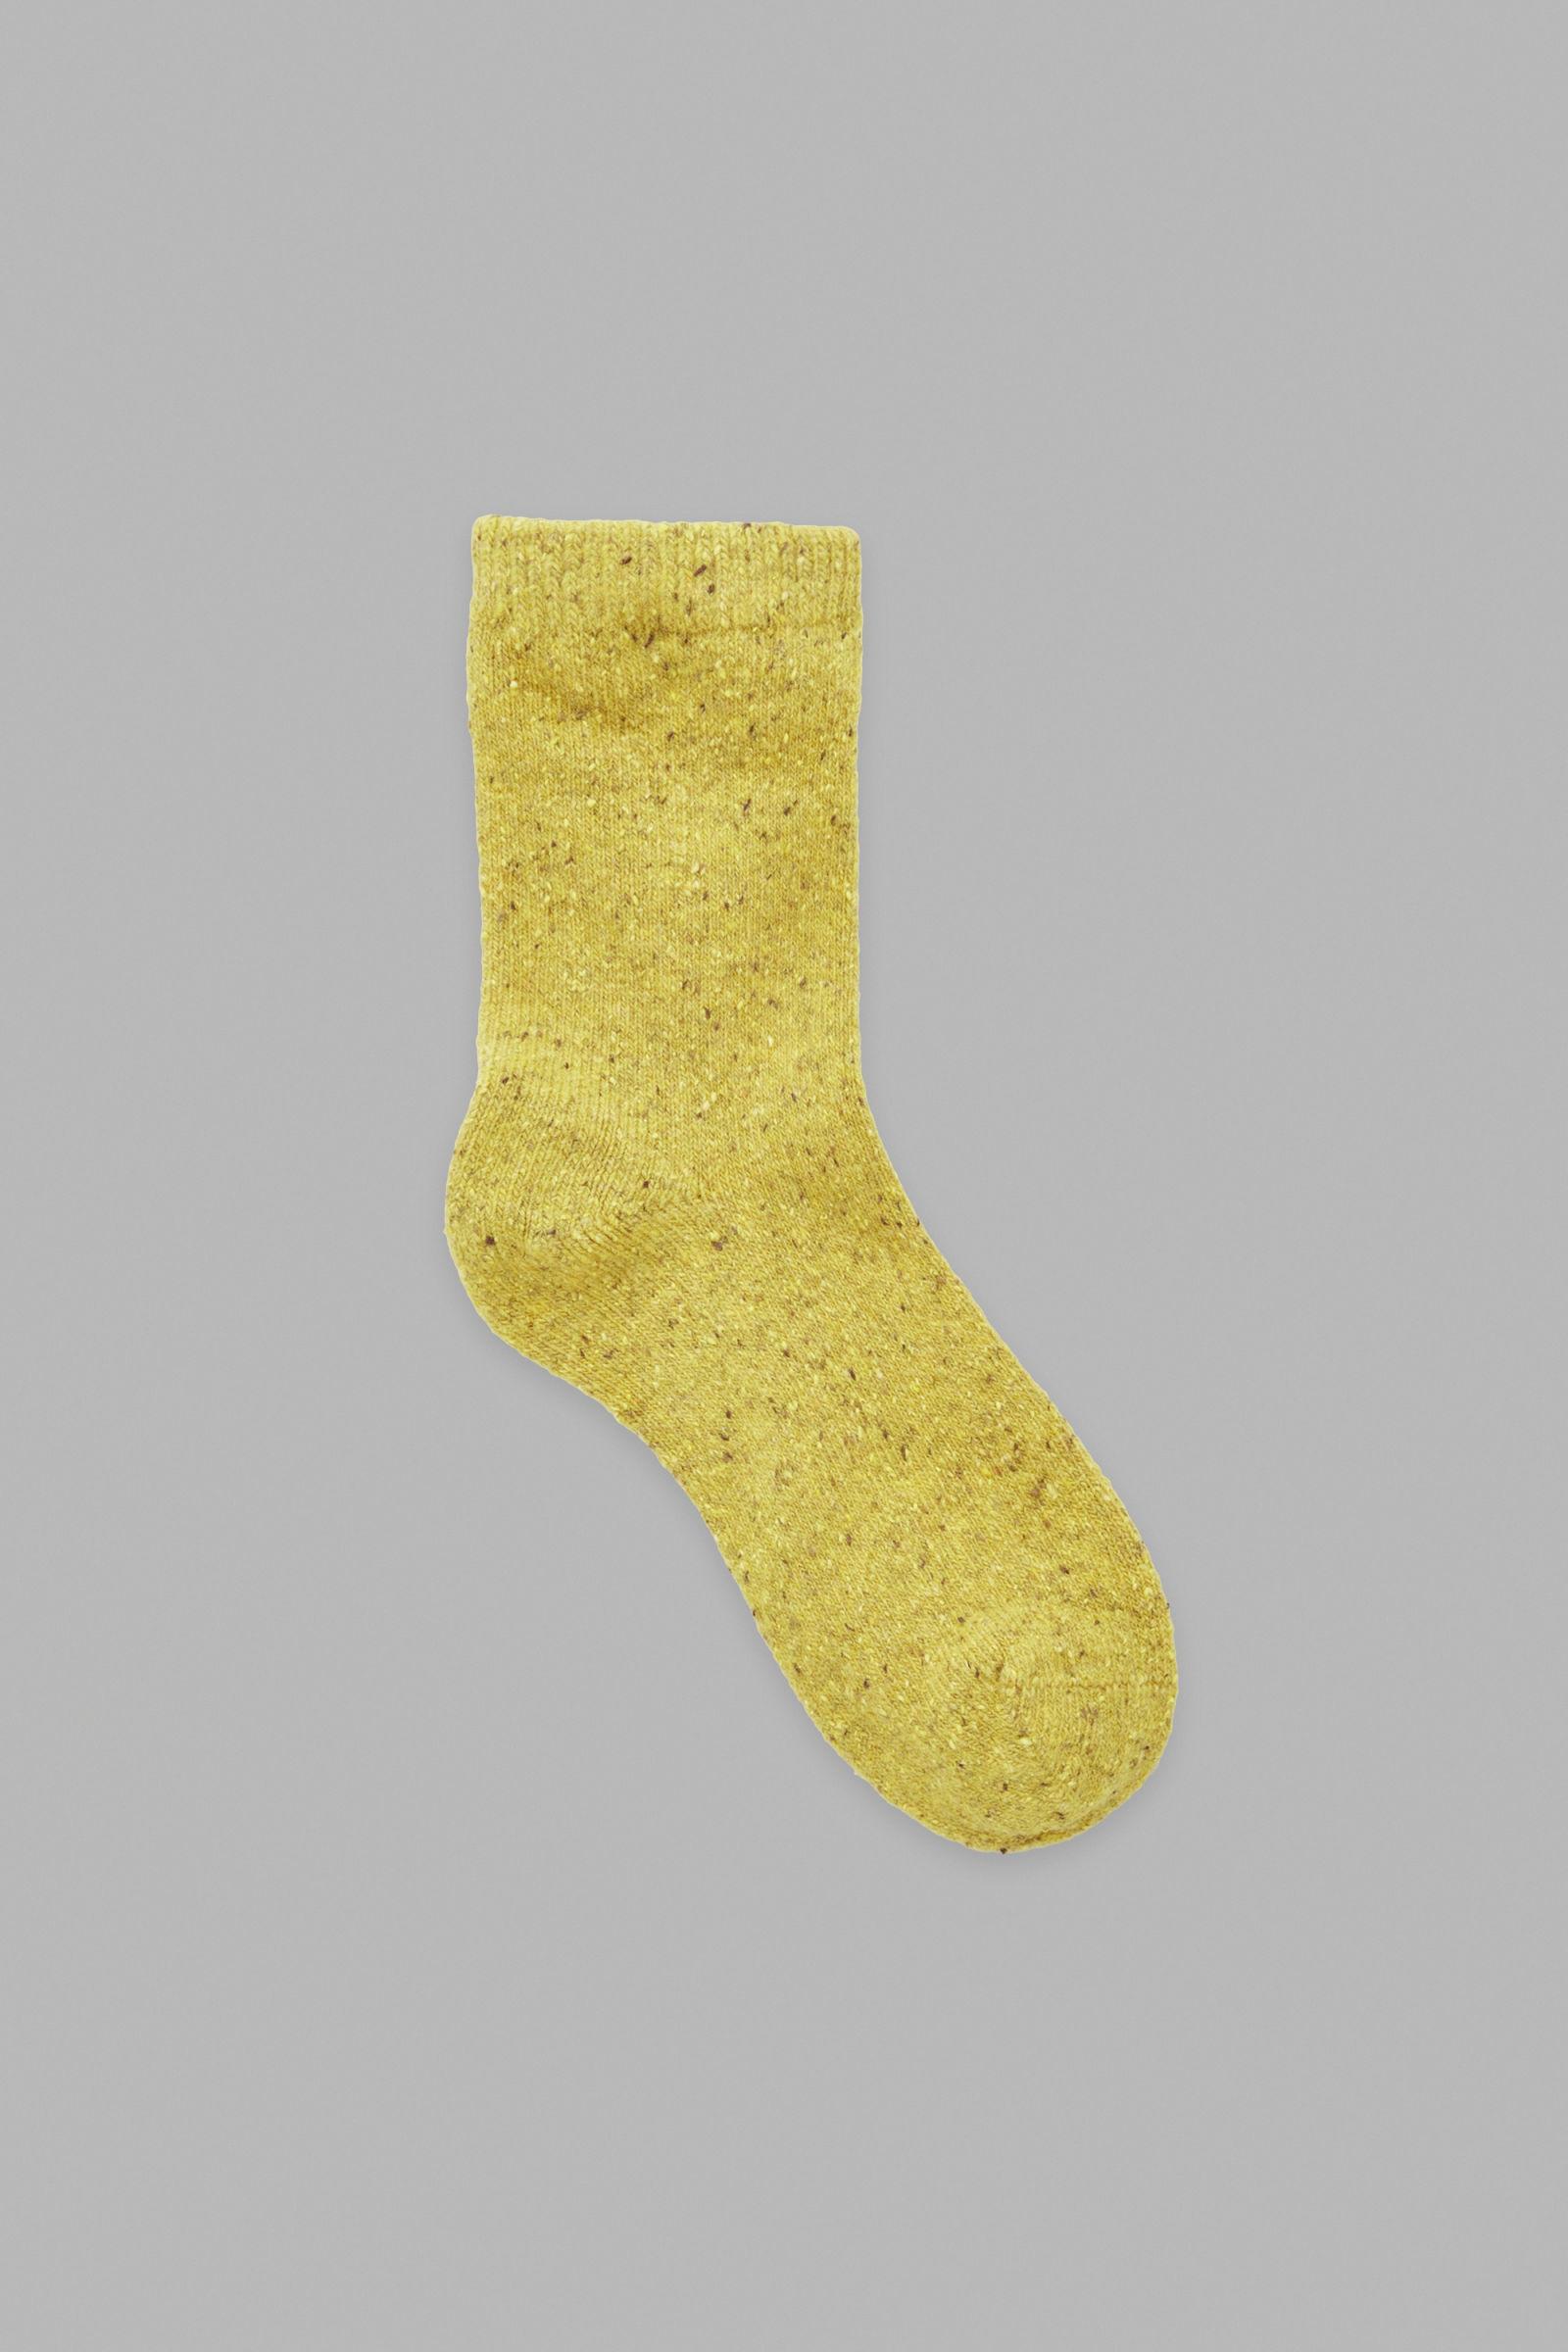 Cos Flecked Socks $11